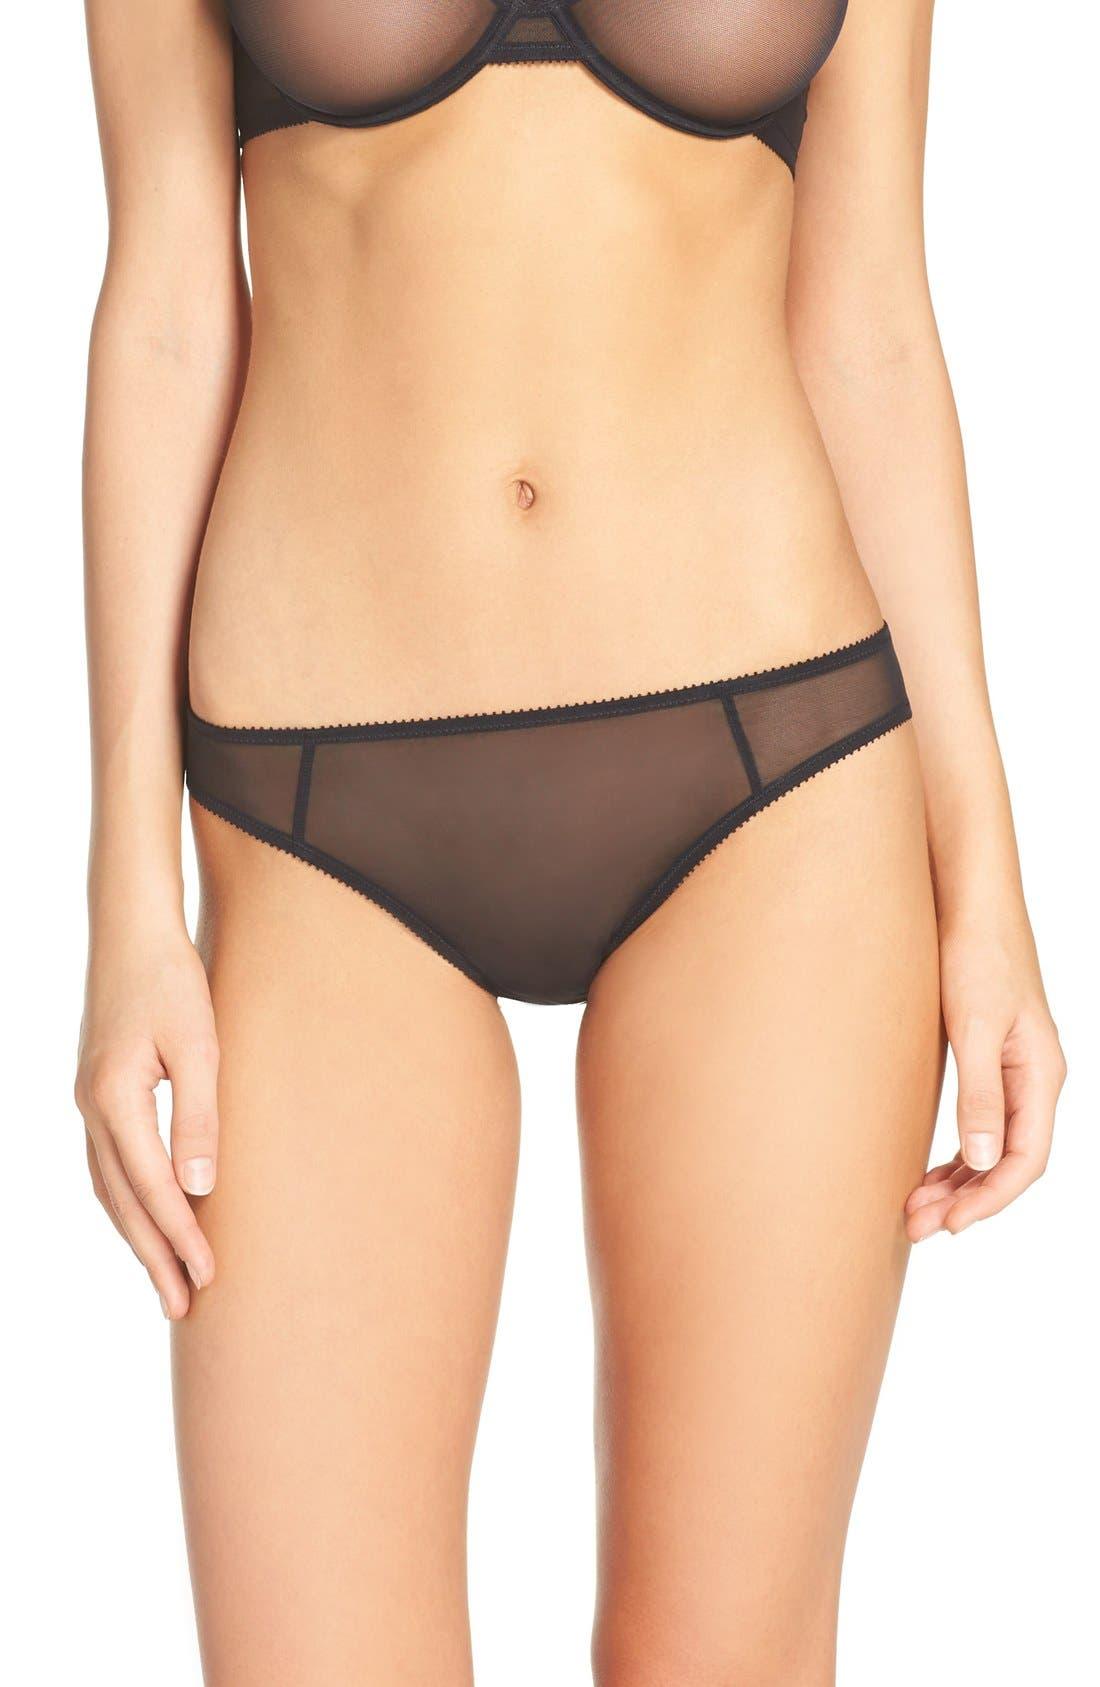 EPURE BY LISE CHARMEL Revelation Beaute Bikini